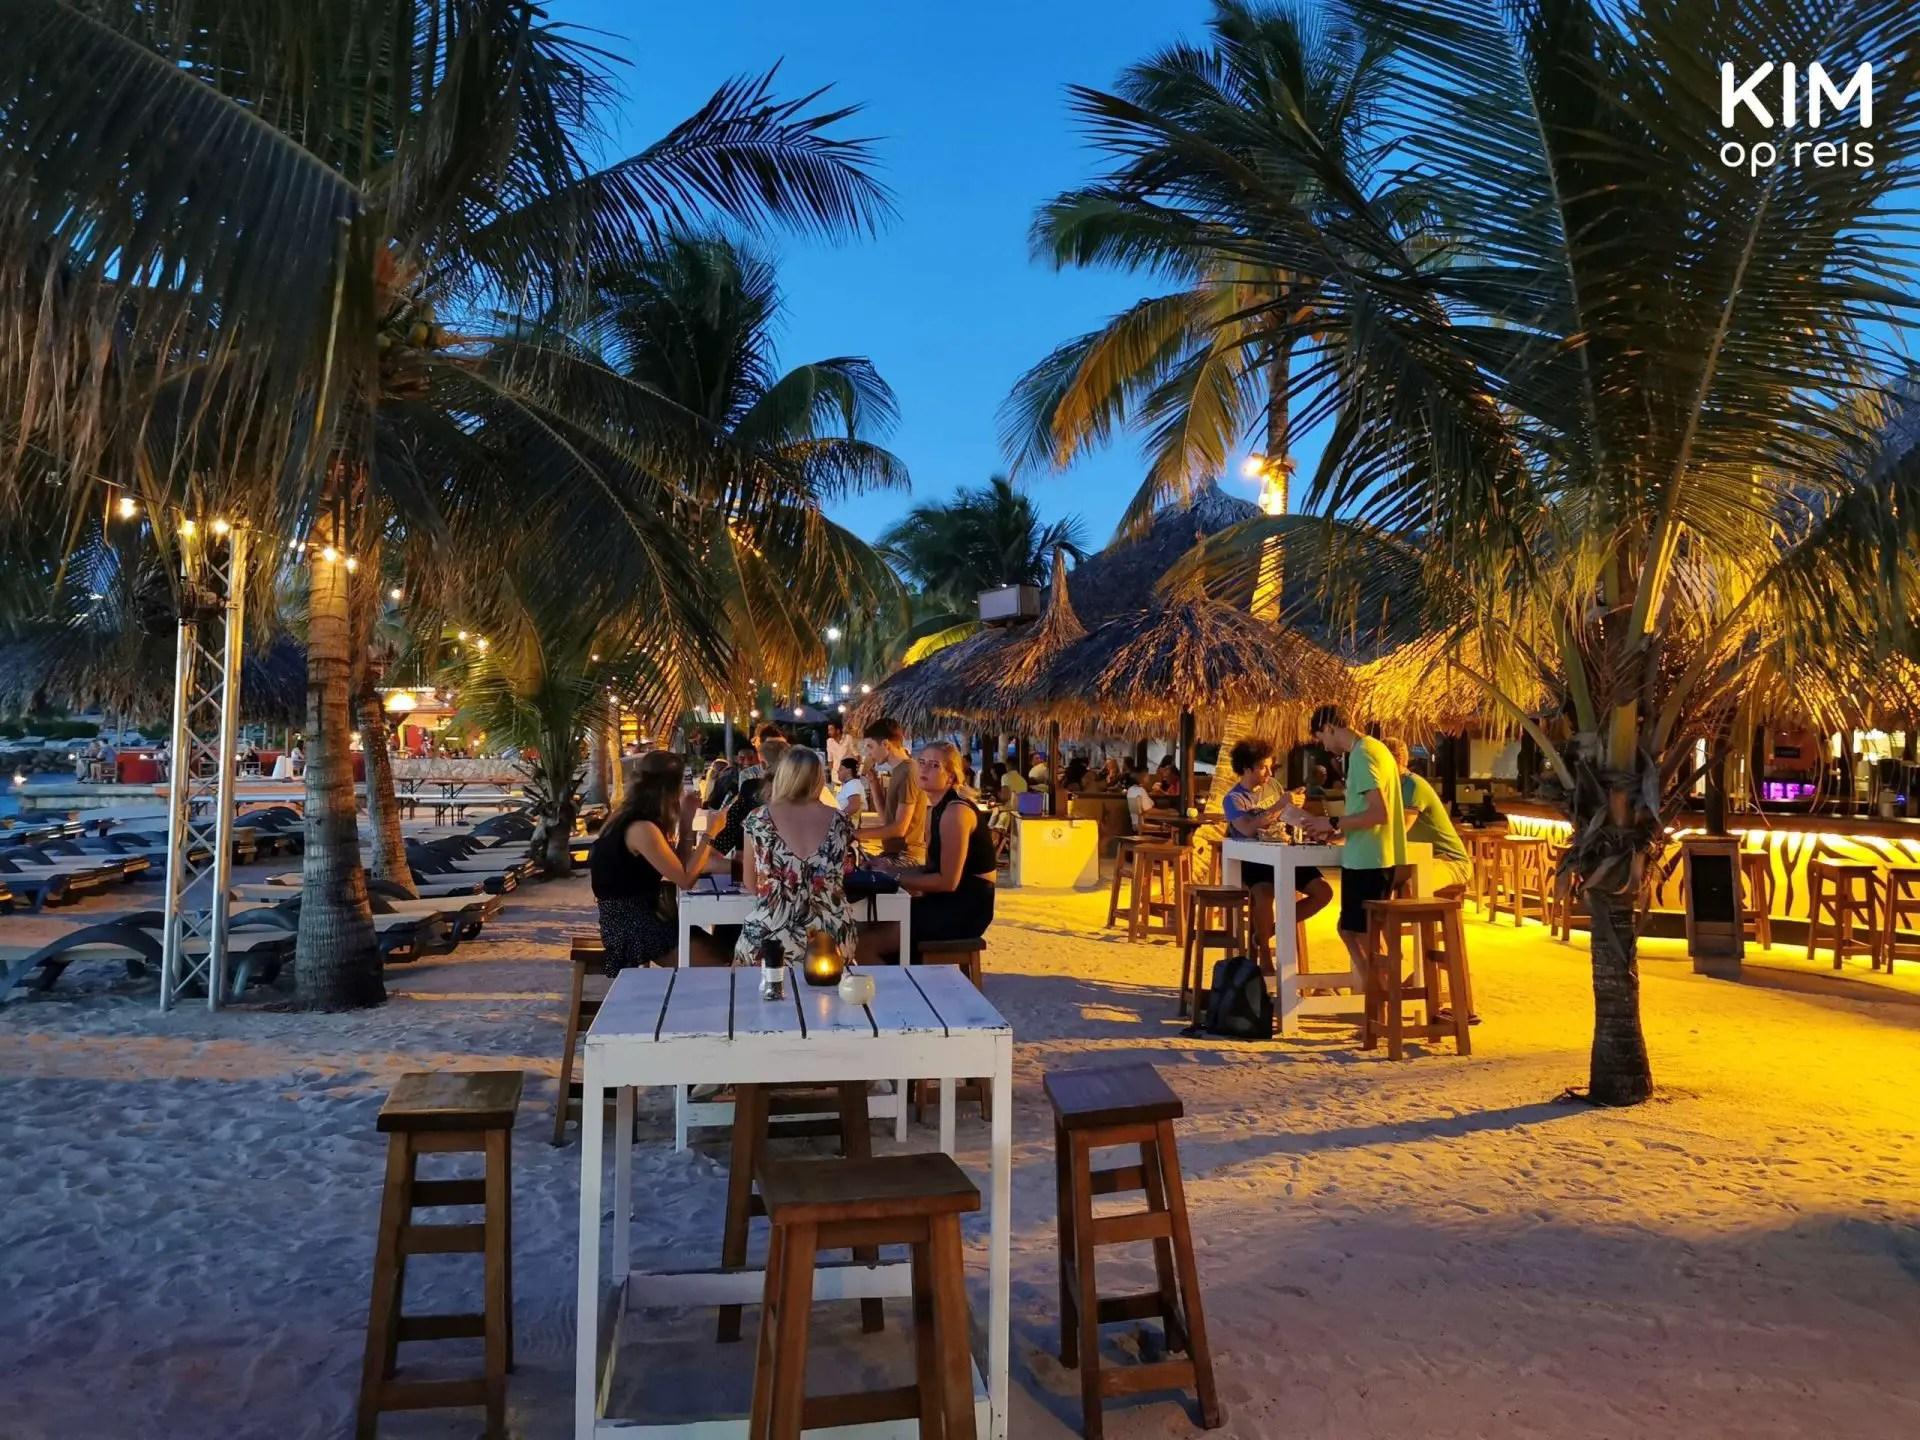 Zanzibar strandrestaurant Curaçao: overzicht restaurant op het strand net na zonsondergang